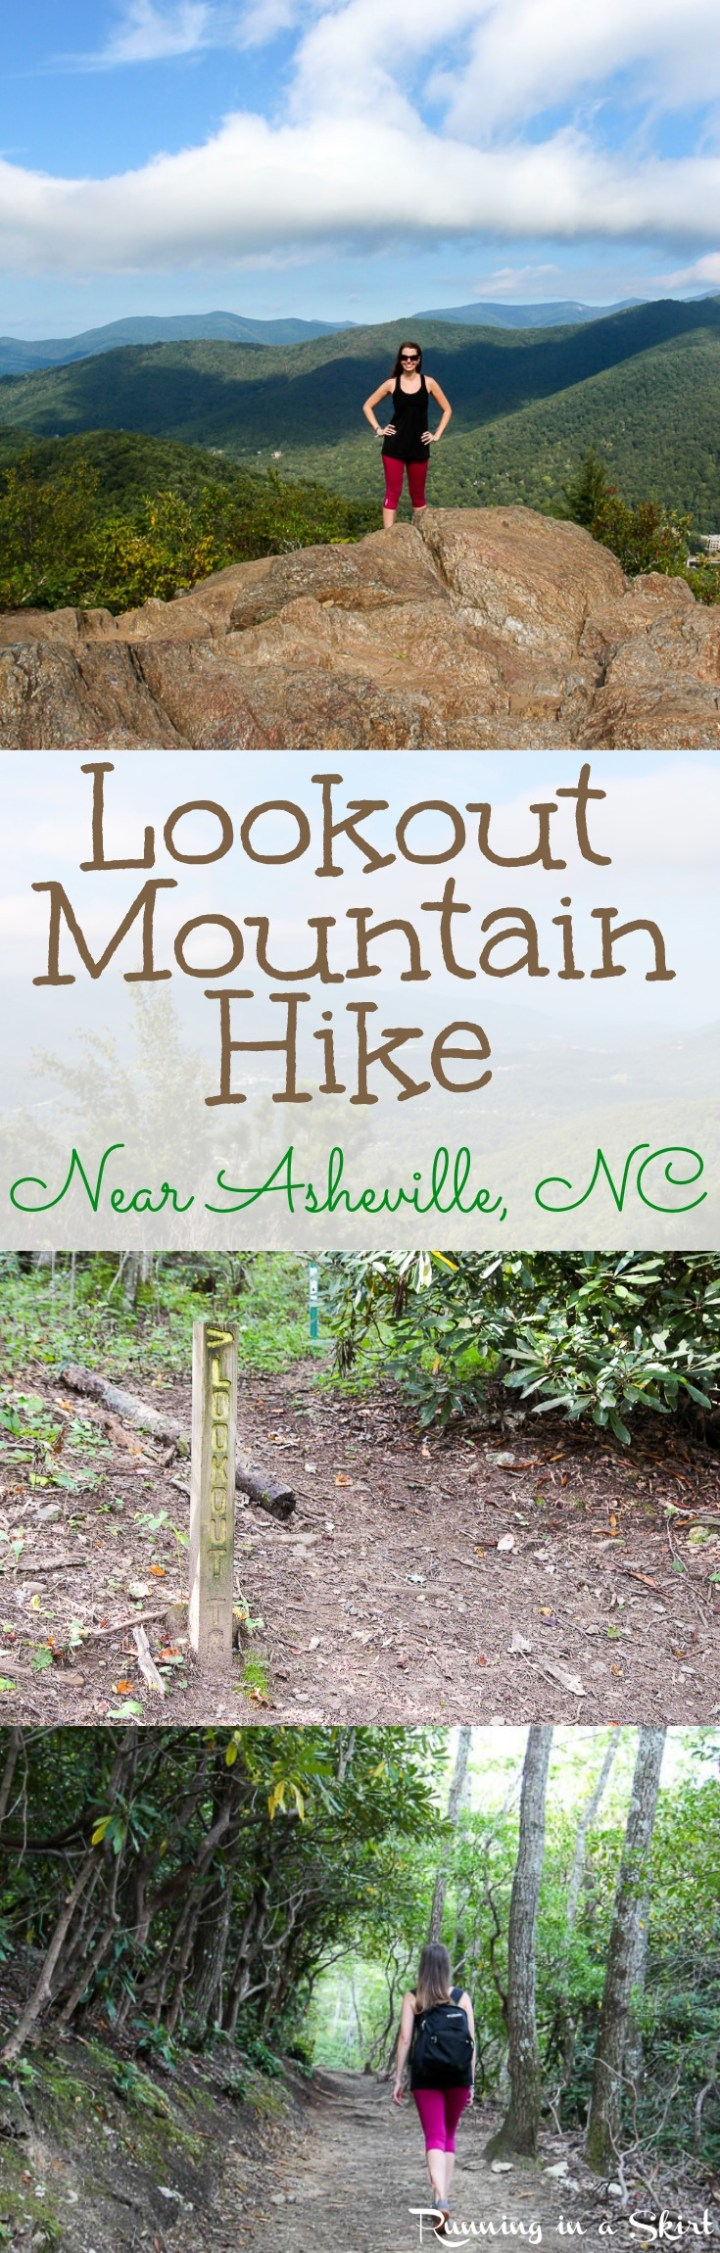 lookout-mountain-montreat-hiking-near-asheville-nc